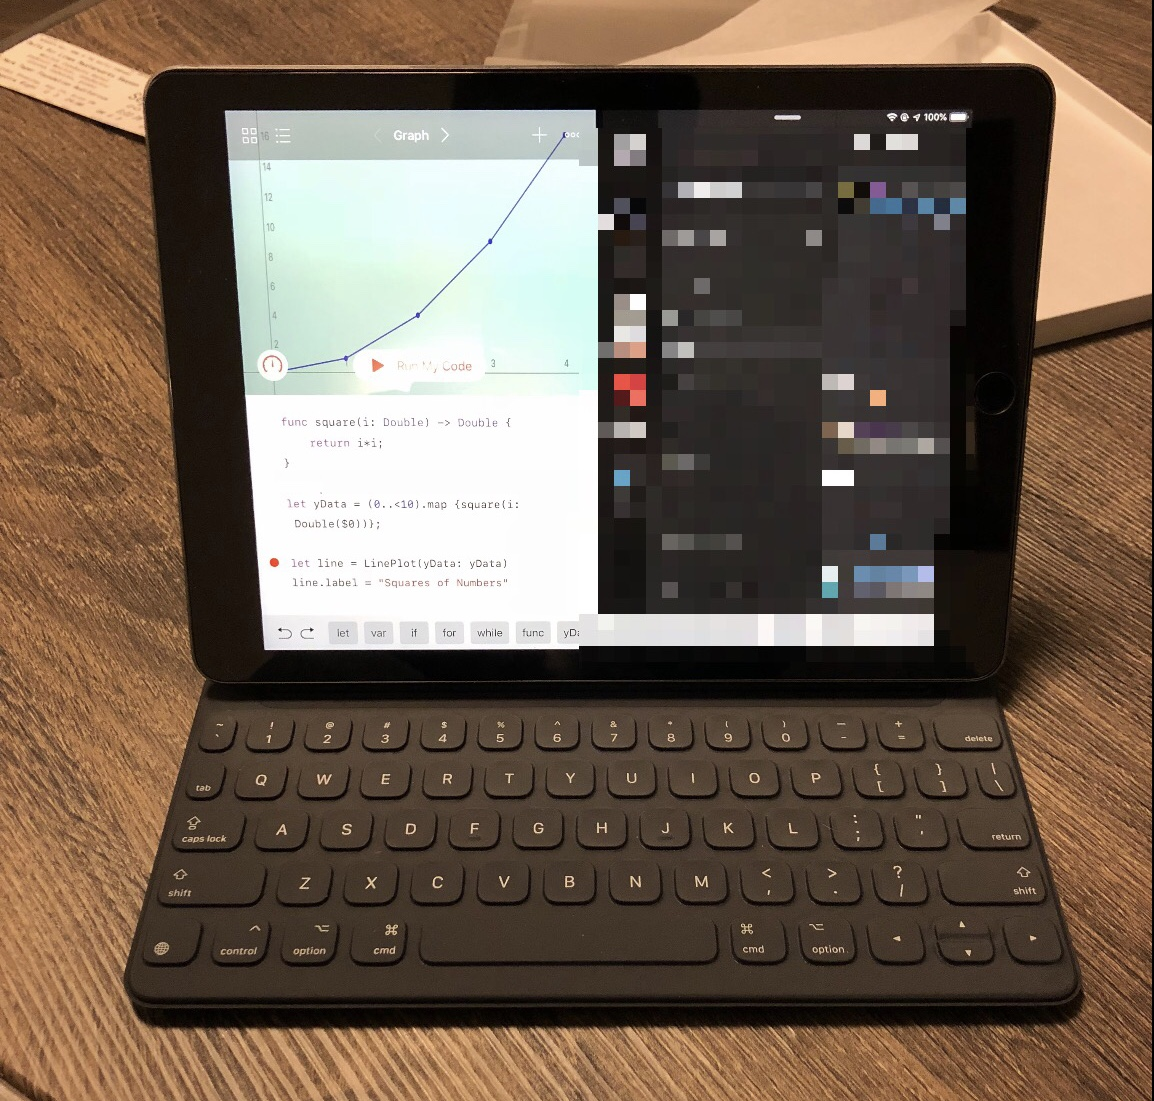 Toward Using the iPad Pro for Development | Ben Congdon